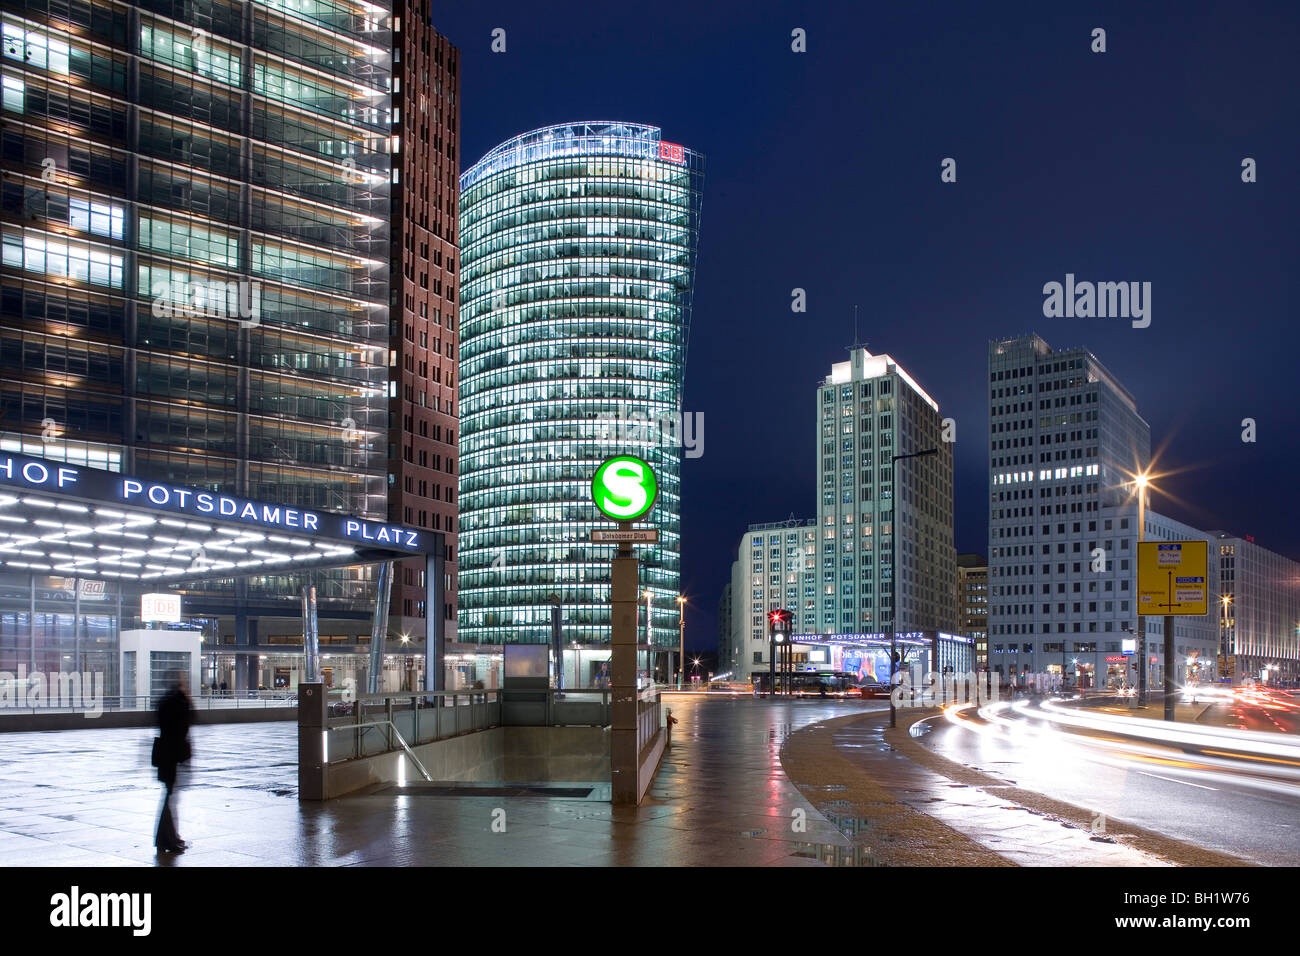 Potsdamer Platz at night from left to right, Renzo Piano Tower, Hans Kollhoff Tower, Bahn Tower, Beisheim Center, - Stock Image